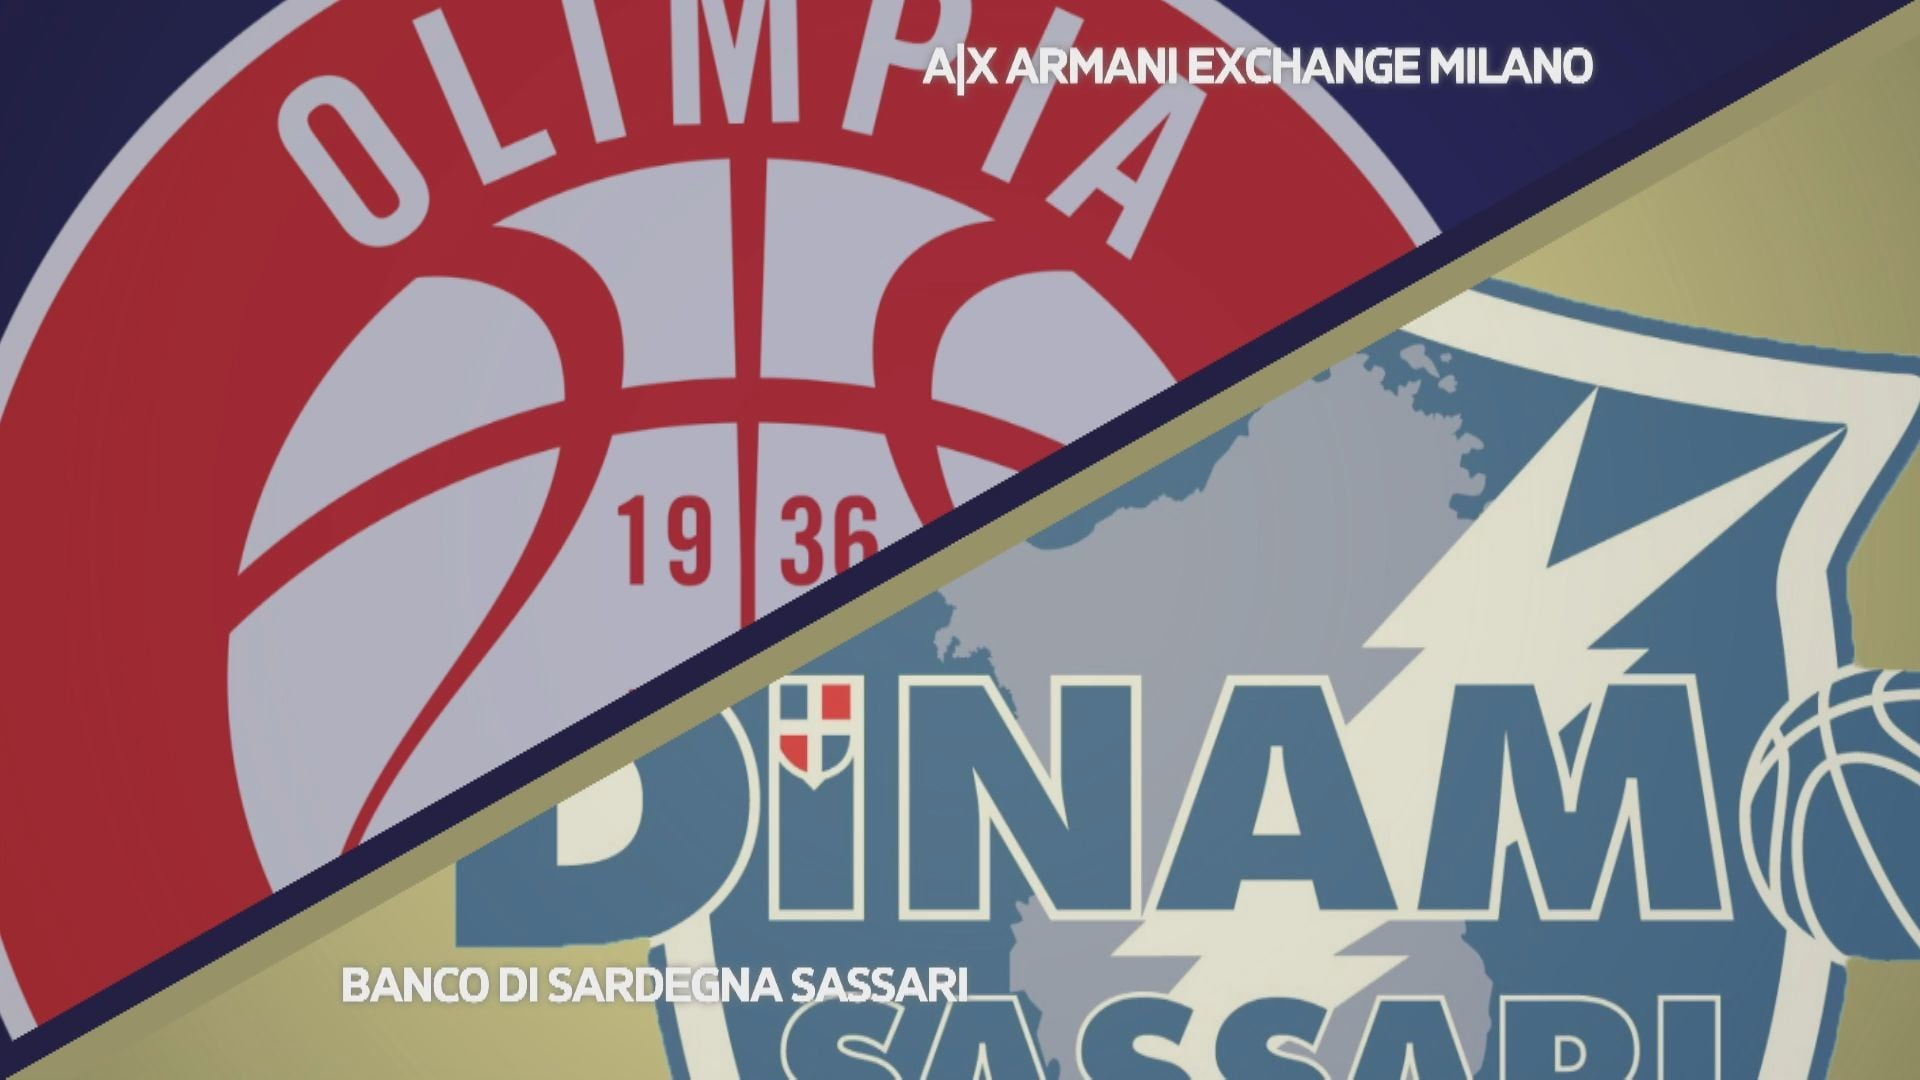 A|X Armani Exchange Milano - Banco di Sardegna Sassari 90-78